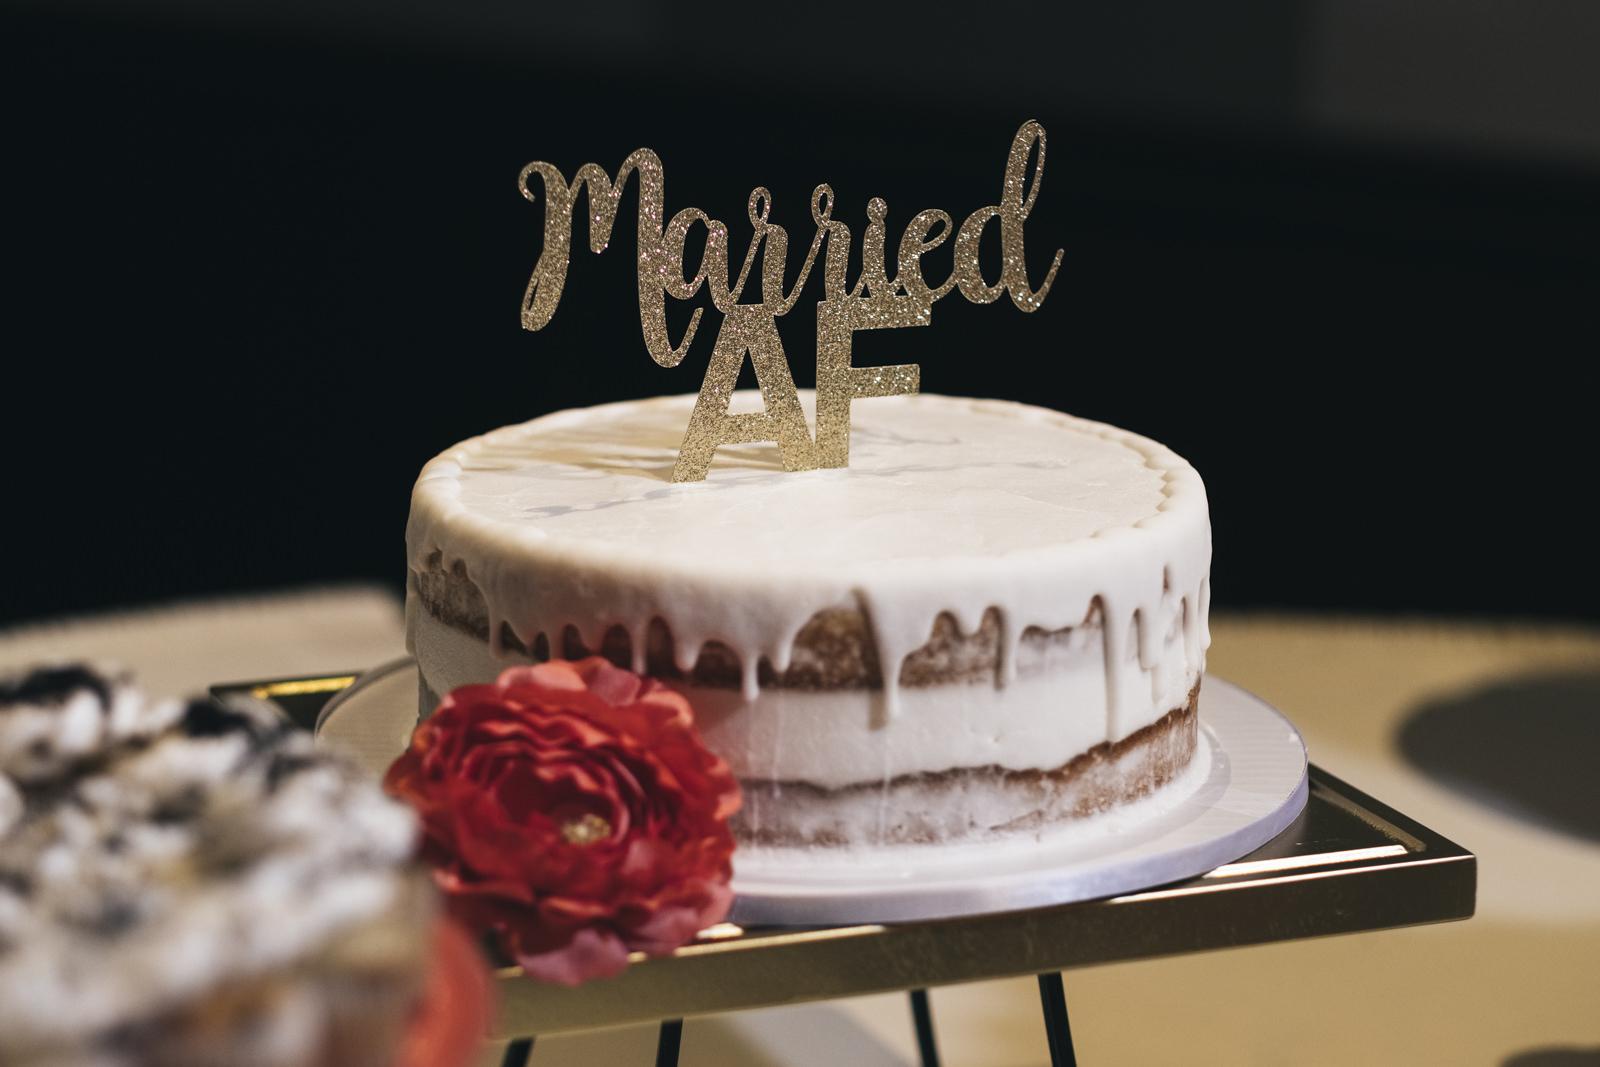 Same-sex wedding cake at The Premier.